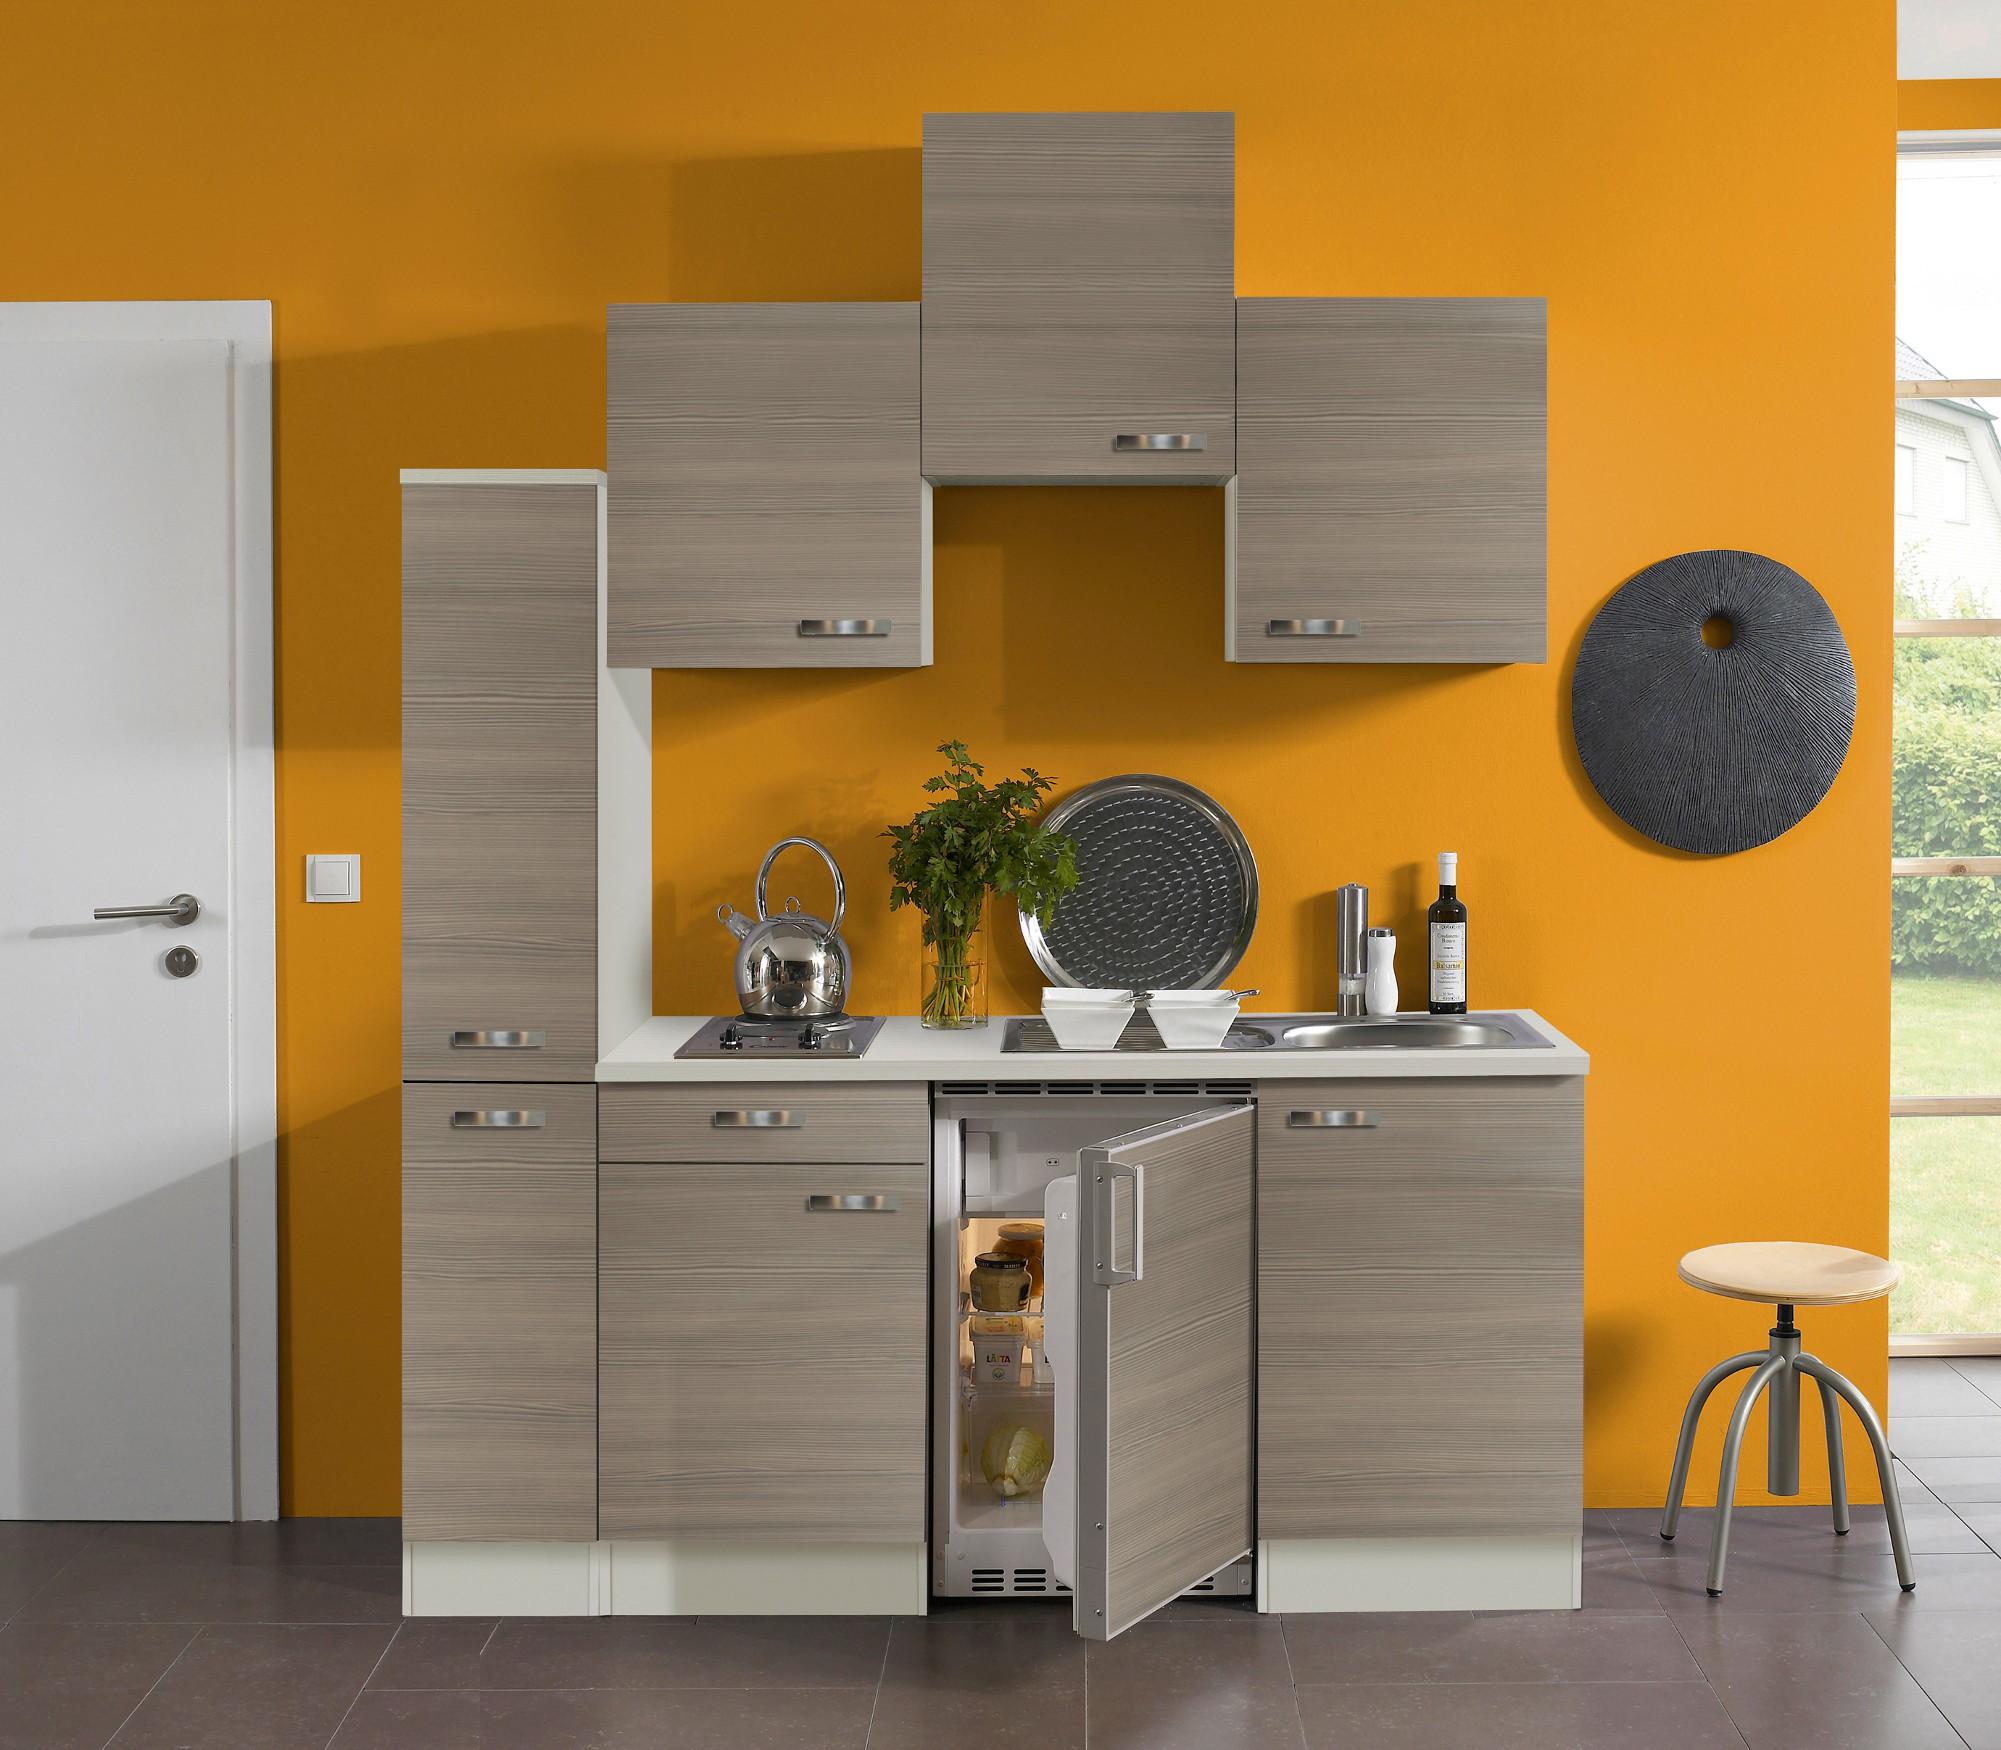 singlek che toledo vario 1 mit elektro kochfeld breite 180 cm pinie k che singlek chen. Black Bedroom Furniture Sets. Home Design Ideas